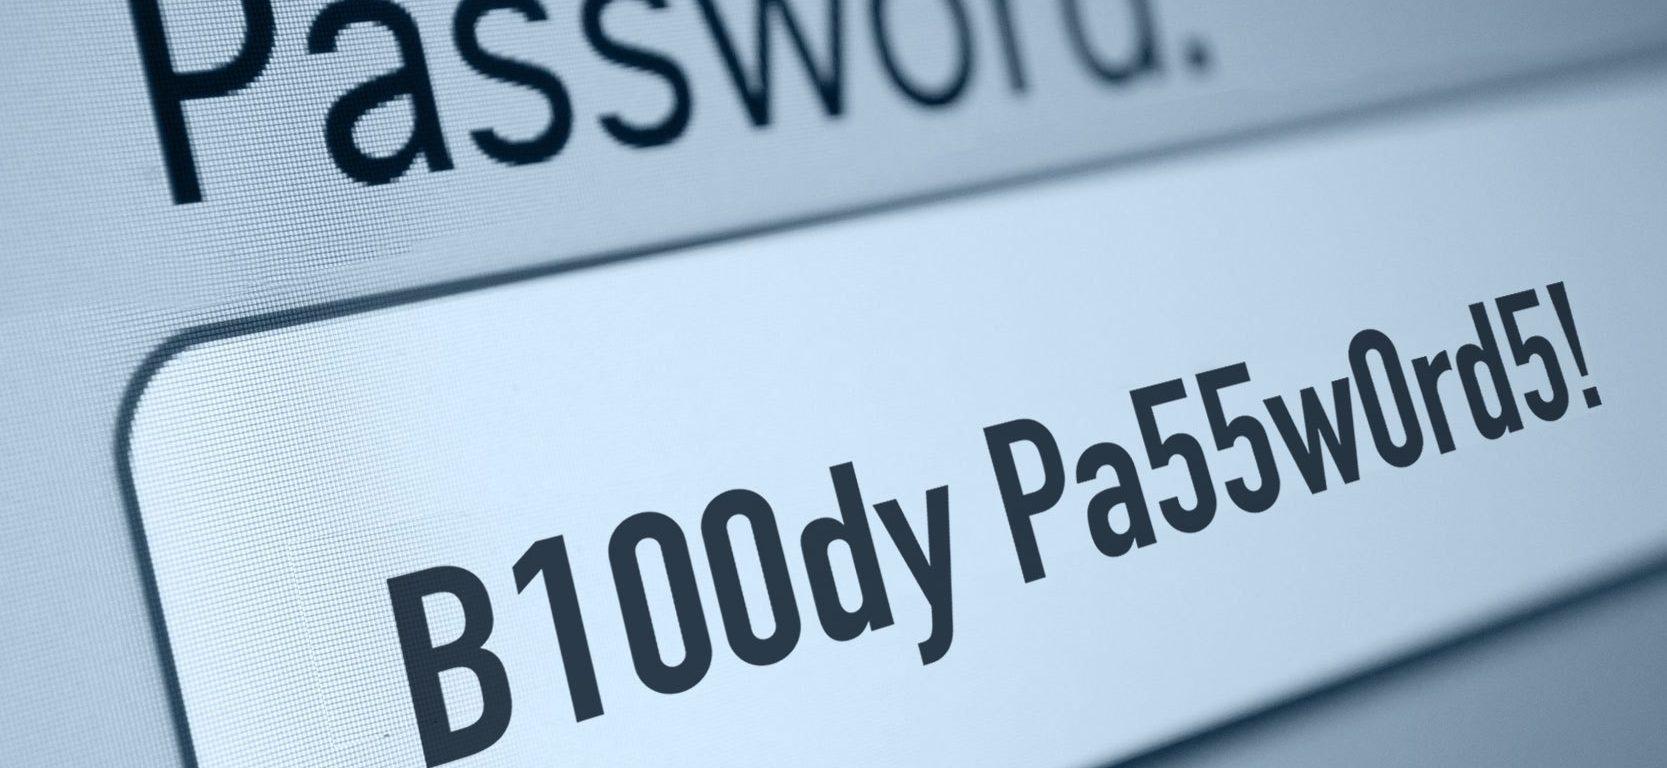 passwordke